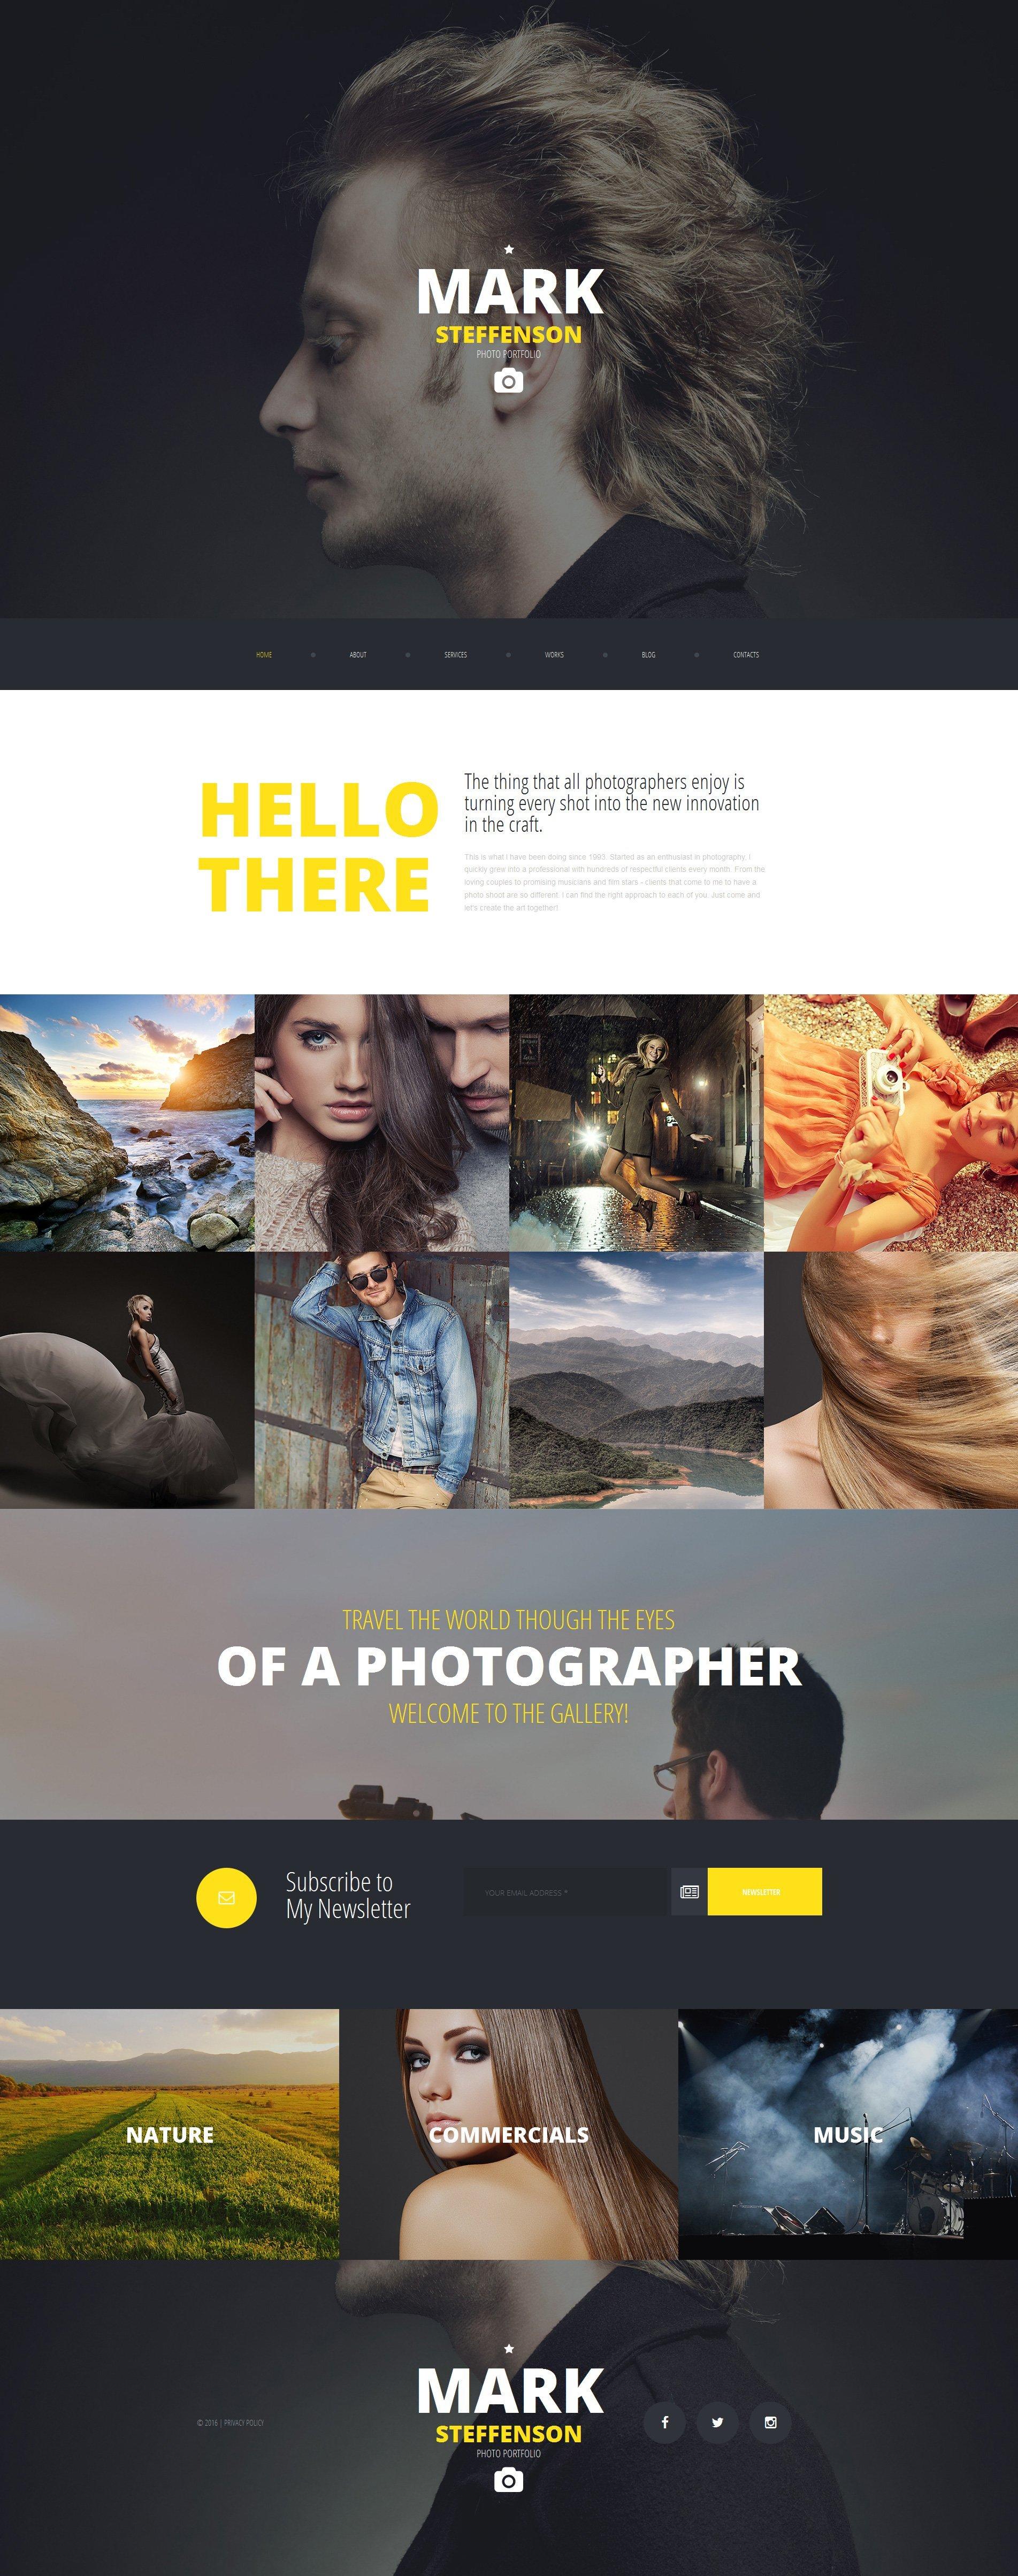 Responsives Moto CMS 3 Template für Fotografen Portfolio #58553